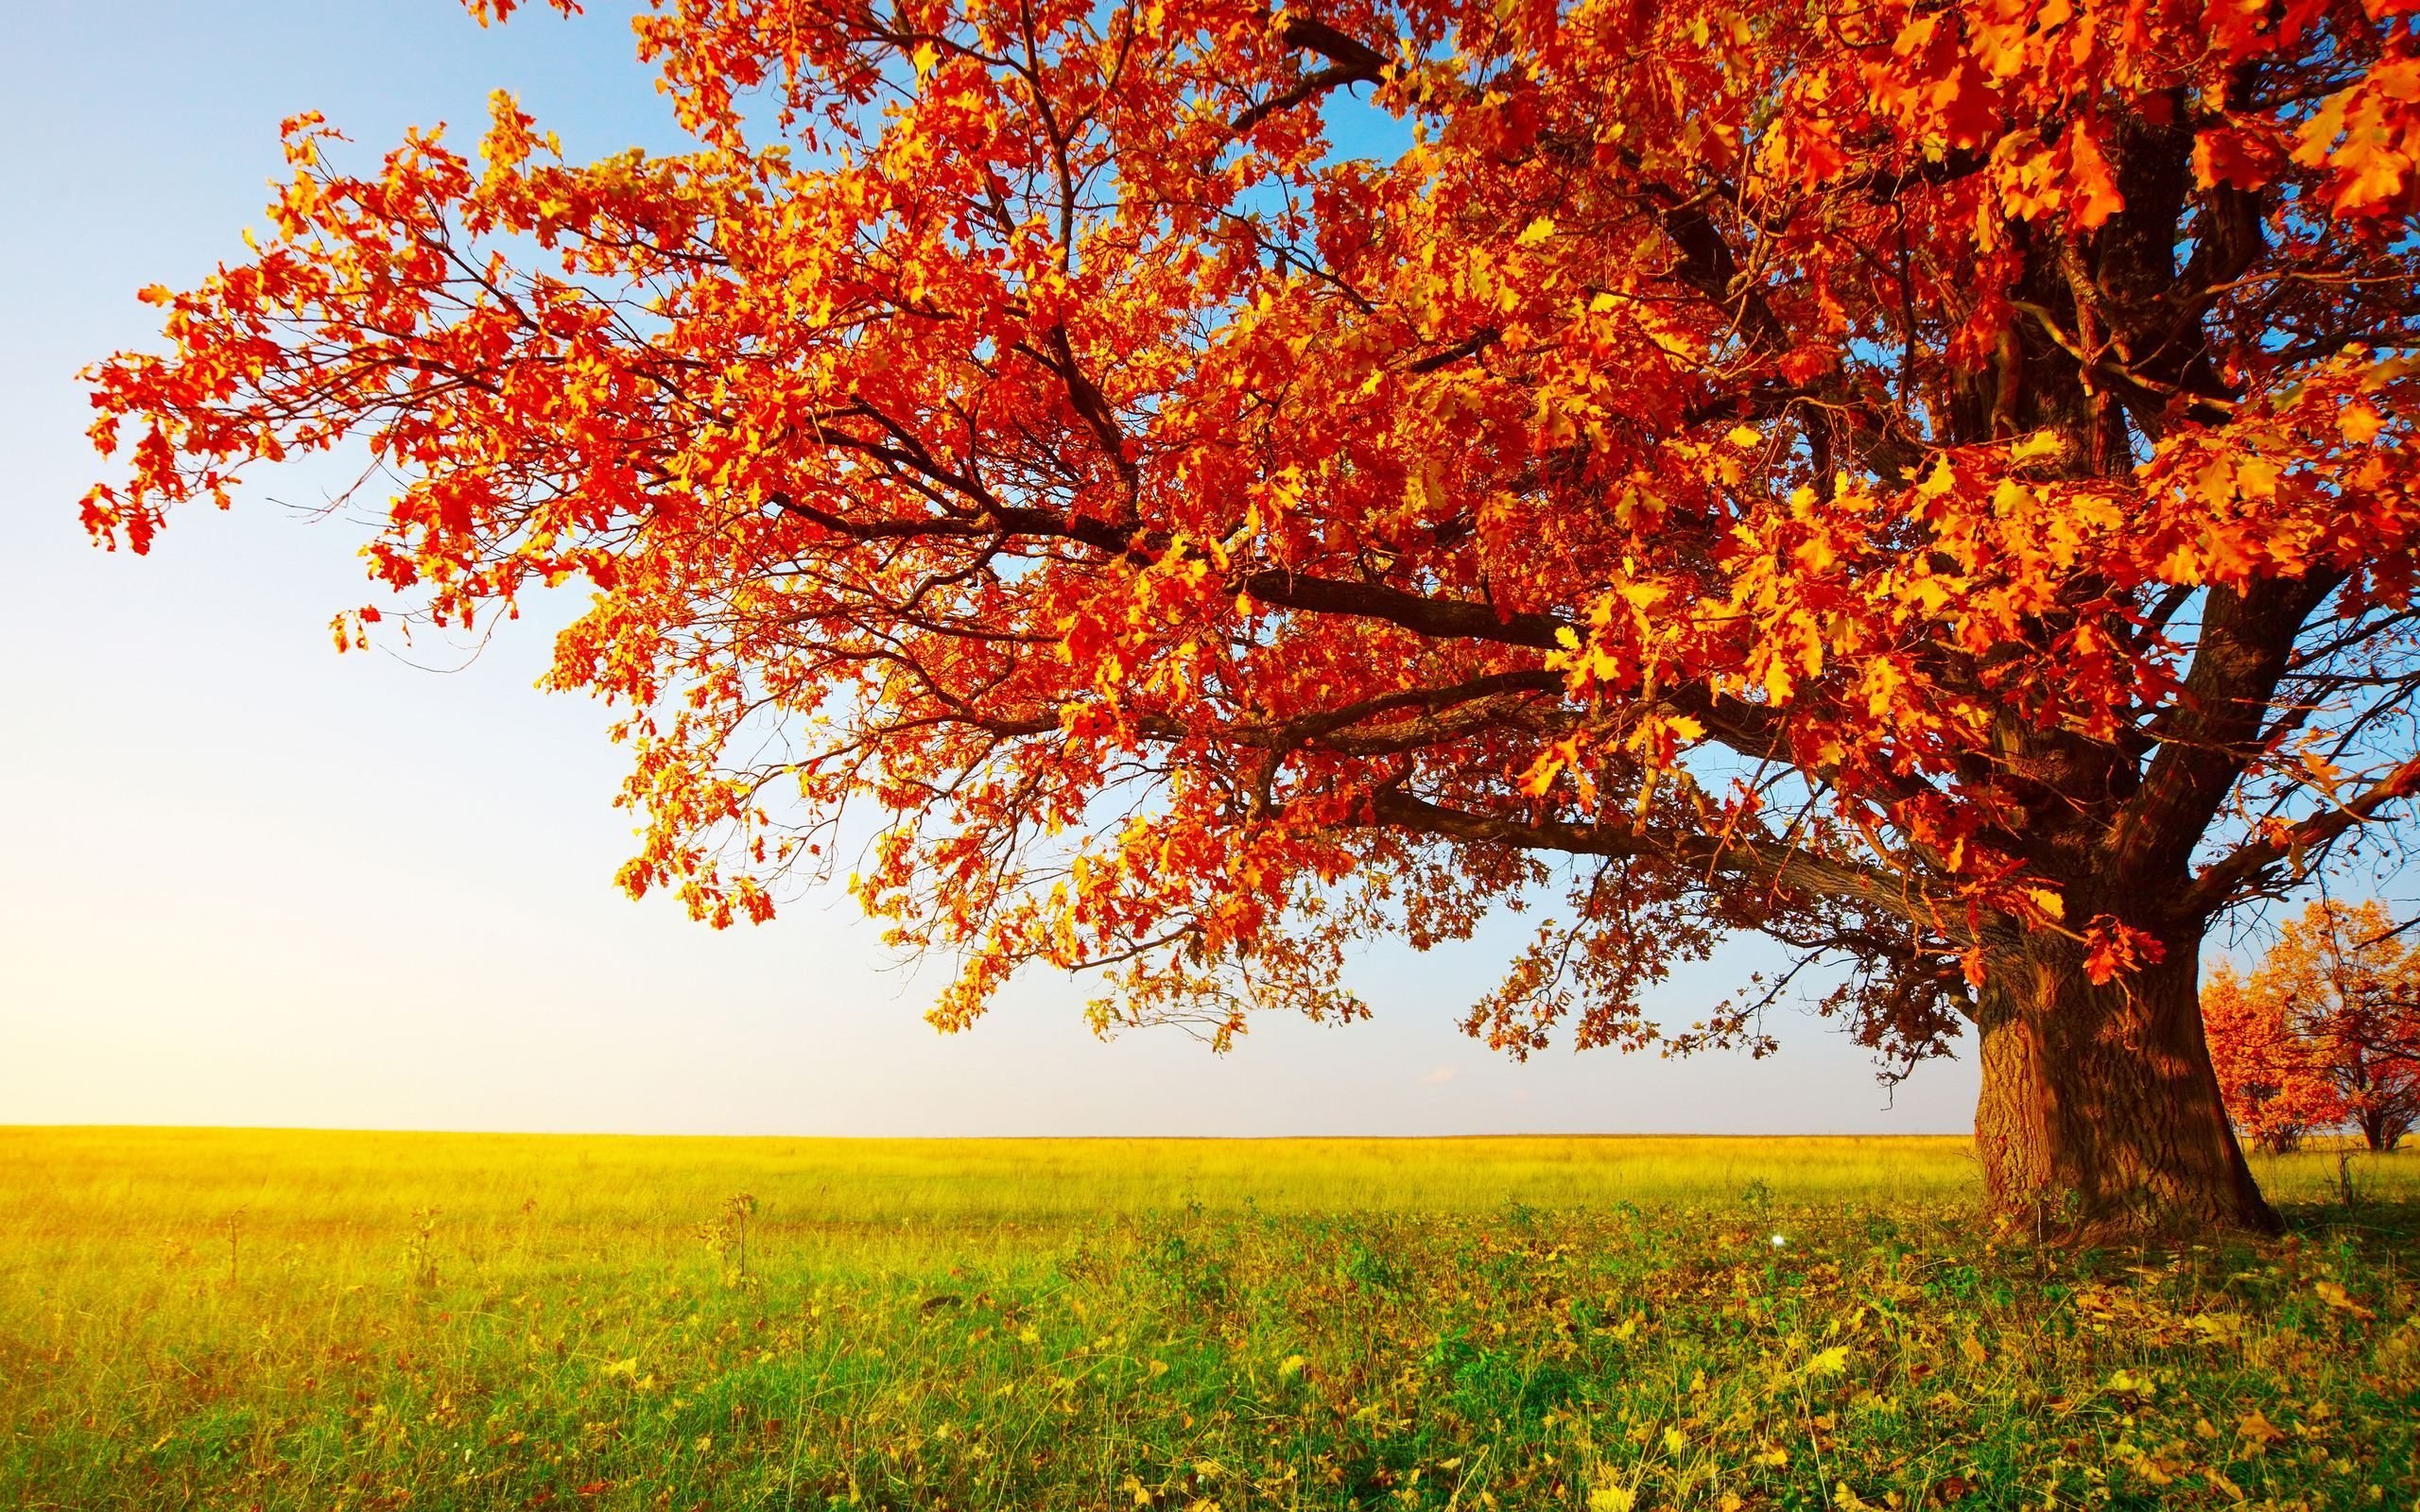 Fall Calendar Desktop Wallpaper November Wallpapers Hd Free Download Pixelstalk Net